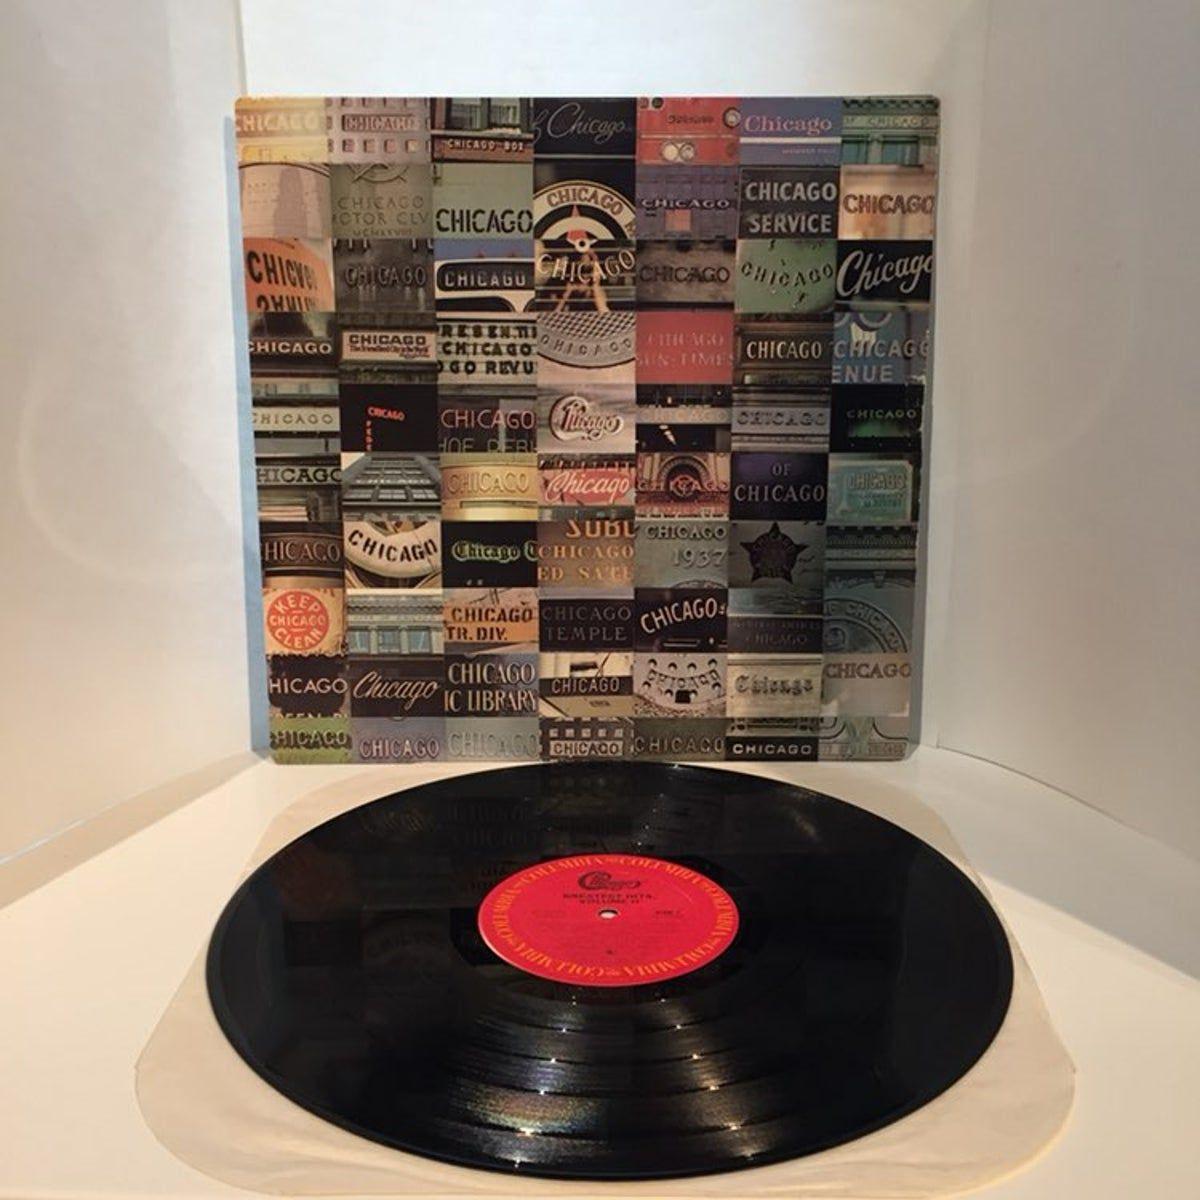 Chicago Greatest Hits Volume 2 Vinyl On Mercari Vinyl Greatest Hits Vinyl Records